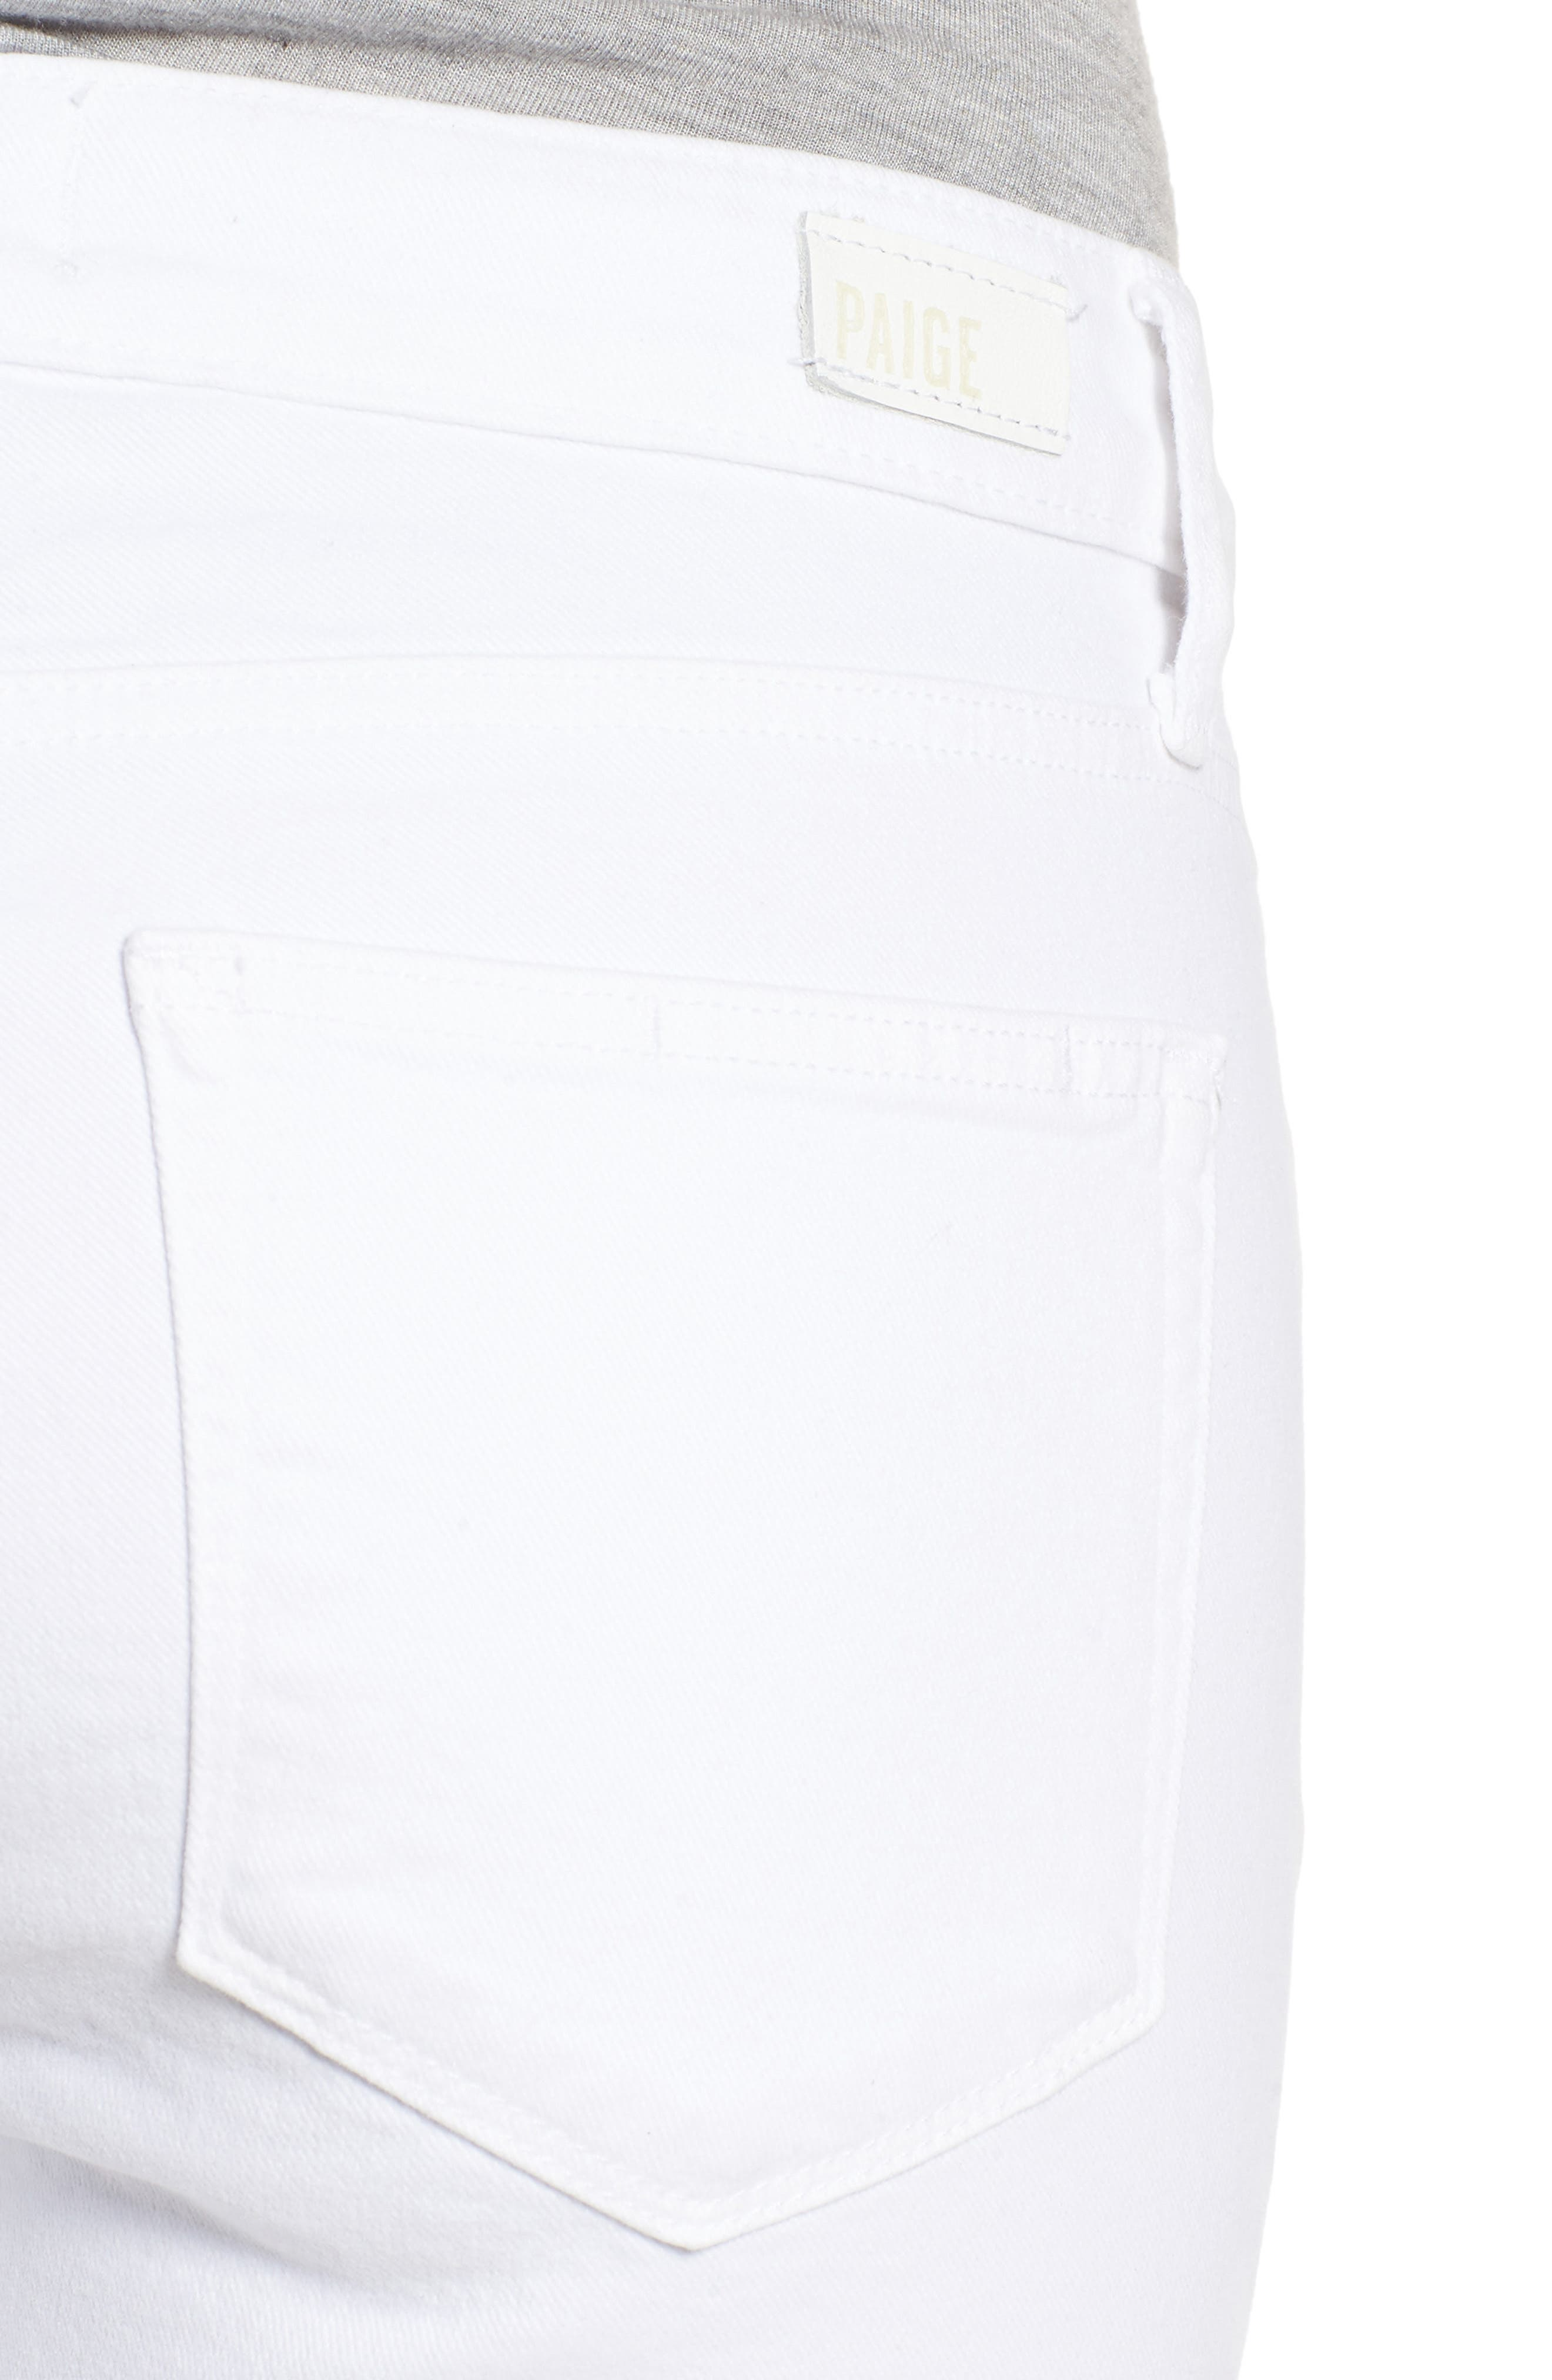 Verdugo Slanted Crop Skinny Jeans,                             Alternate thumbnail 4, color,                             CRISP WHITE